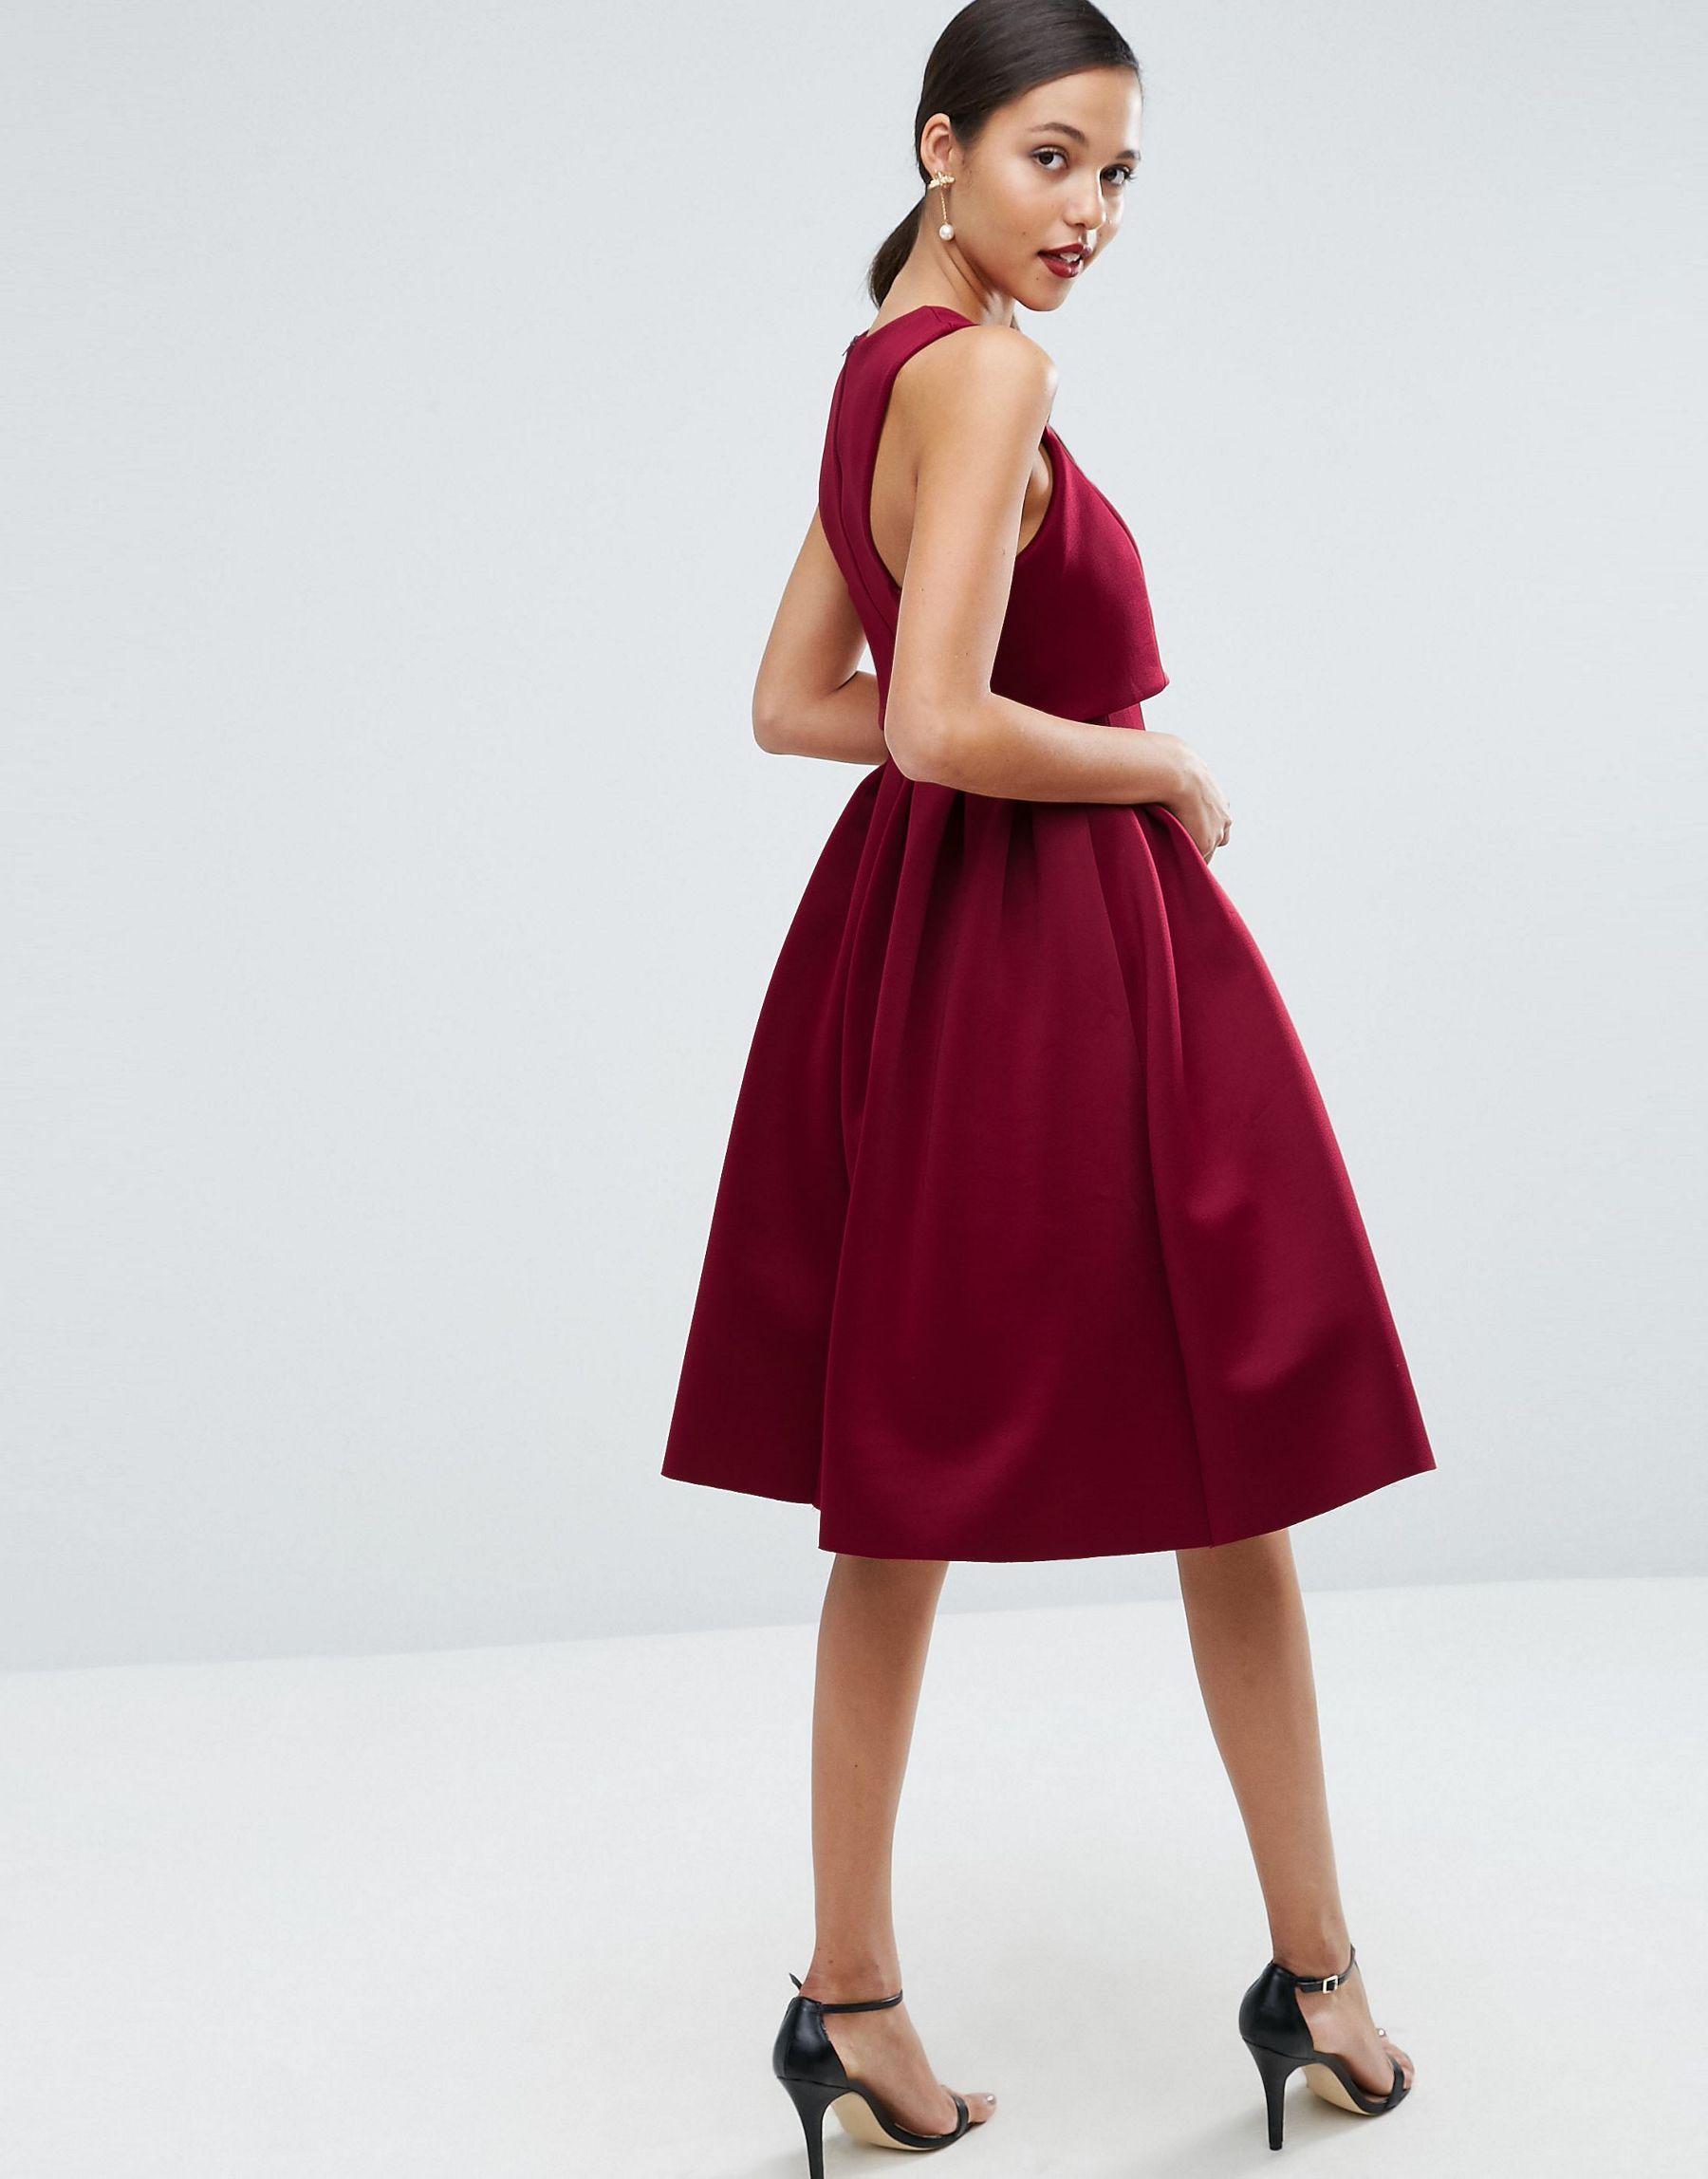 91598d3f2be Lyst - ASOS Debutante Crop Top Midi Scuba Dress in Red